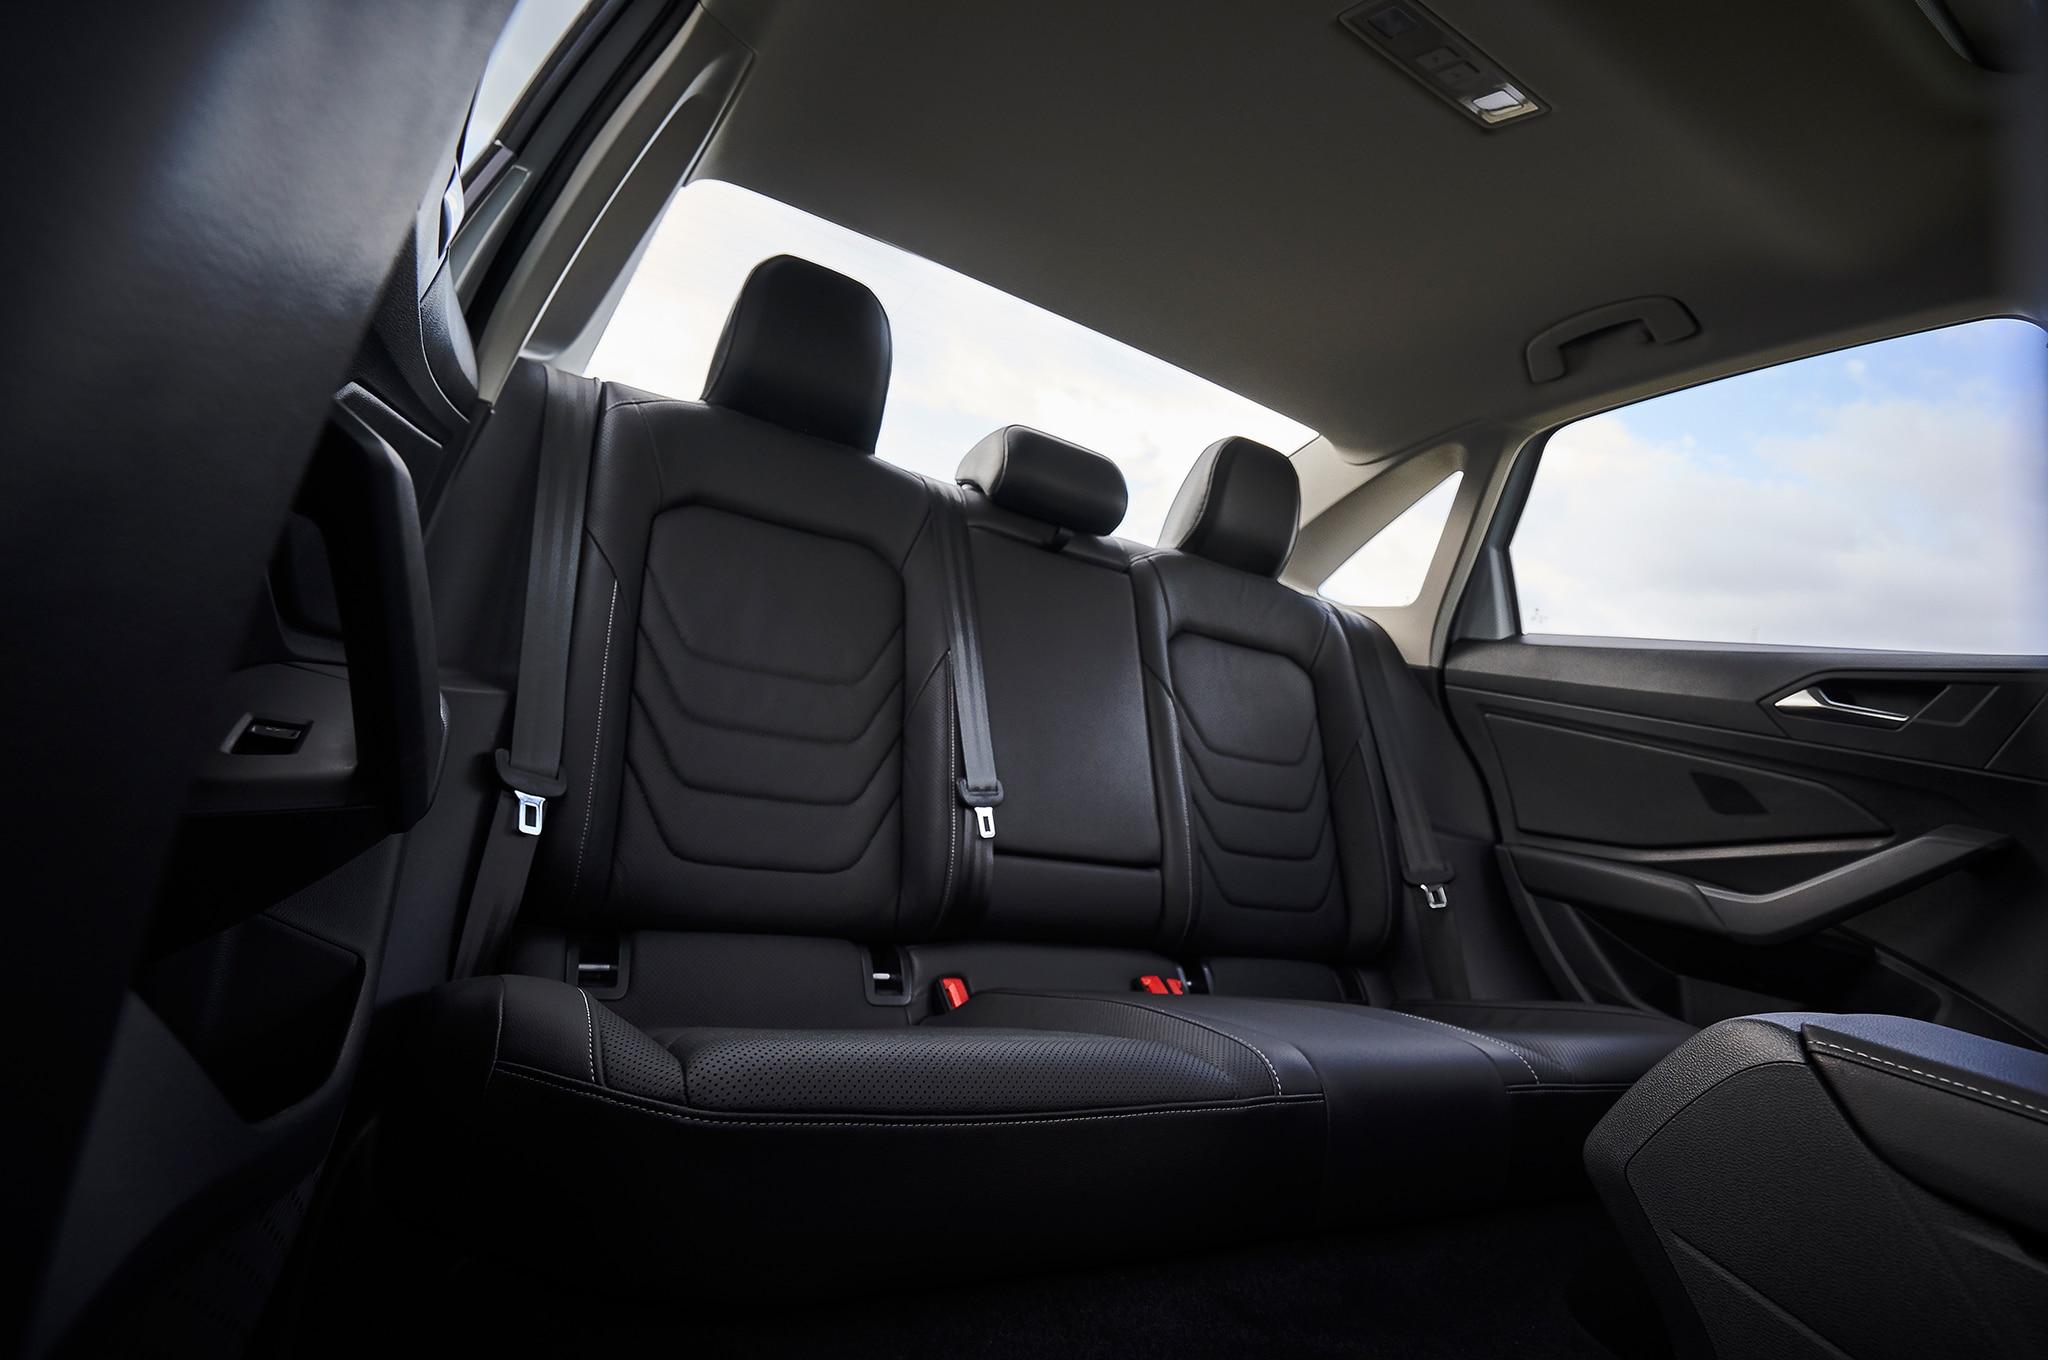 2019 volkswagen jetta first drive review automobile magazine. Black Bedroom Furniture Sets. Home Design Ideas